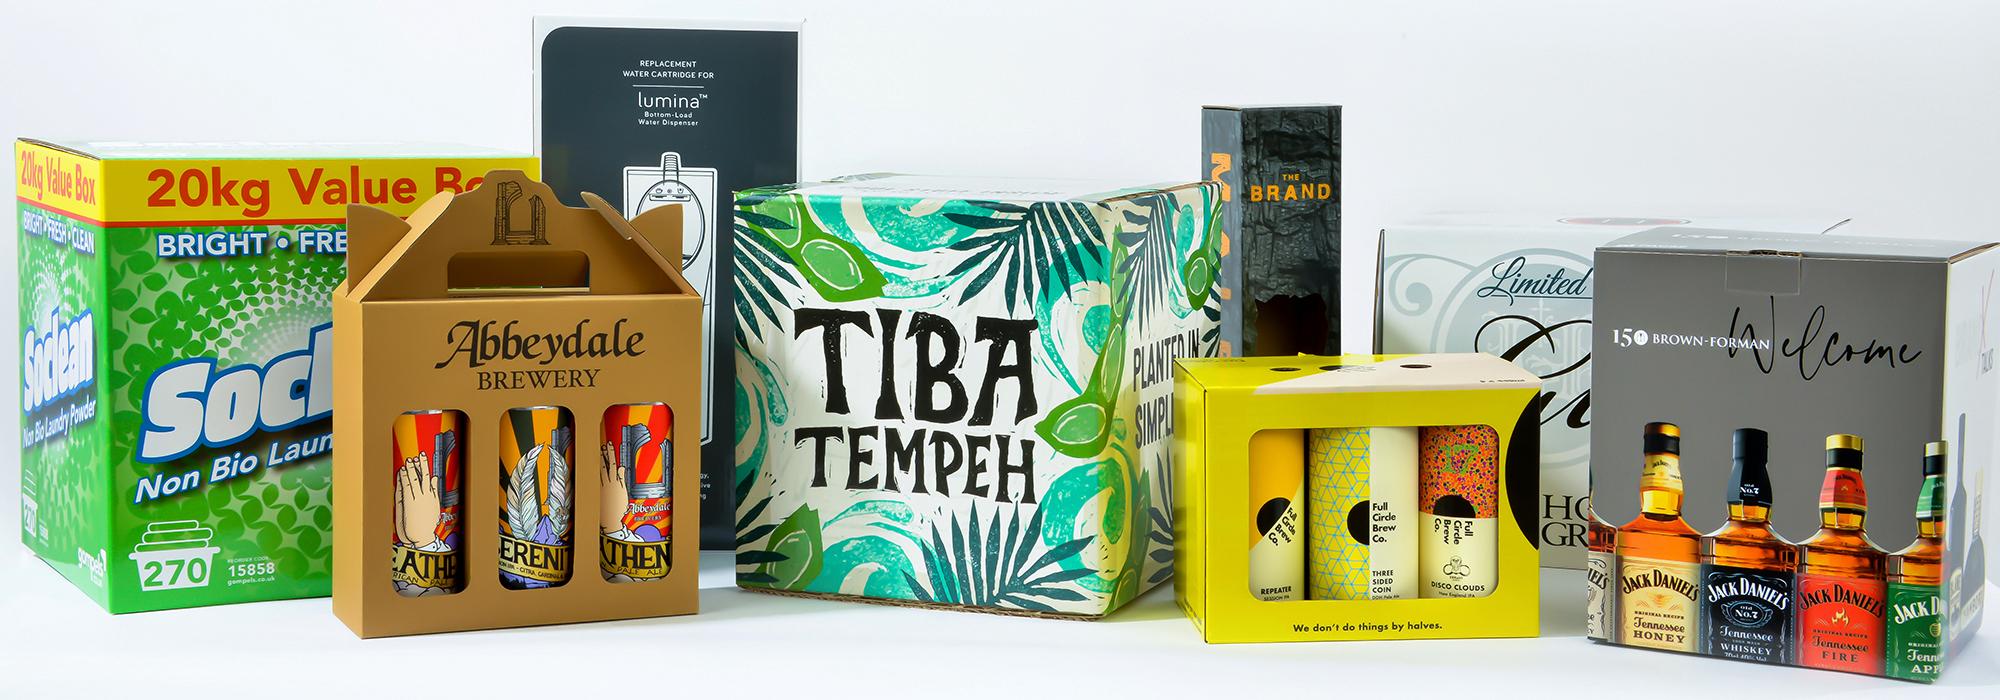 Durham Box - Corrugated Cardboard Packaging